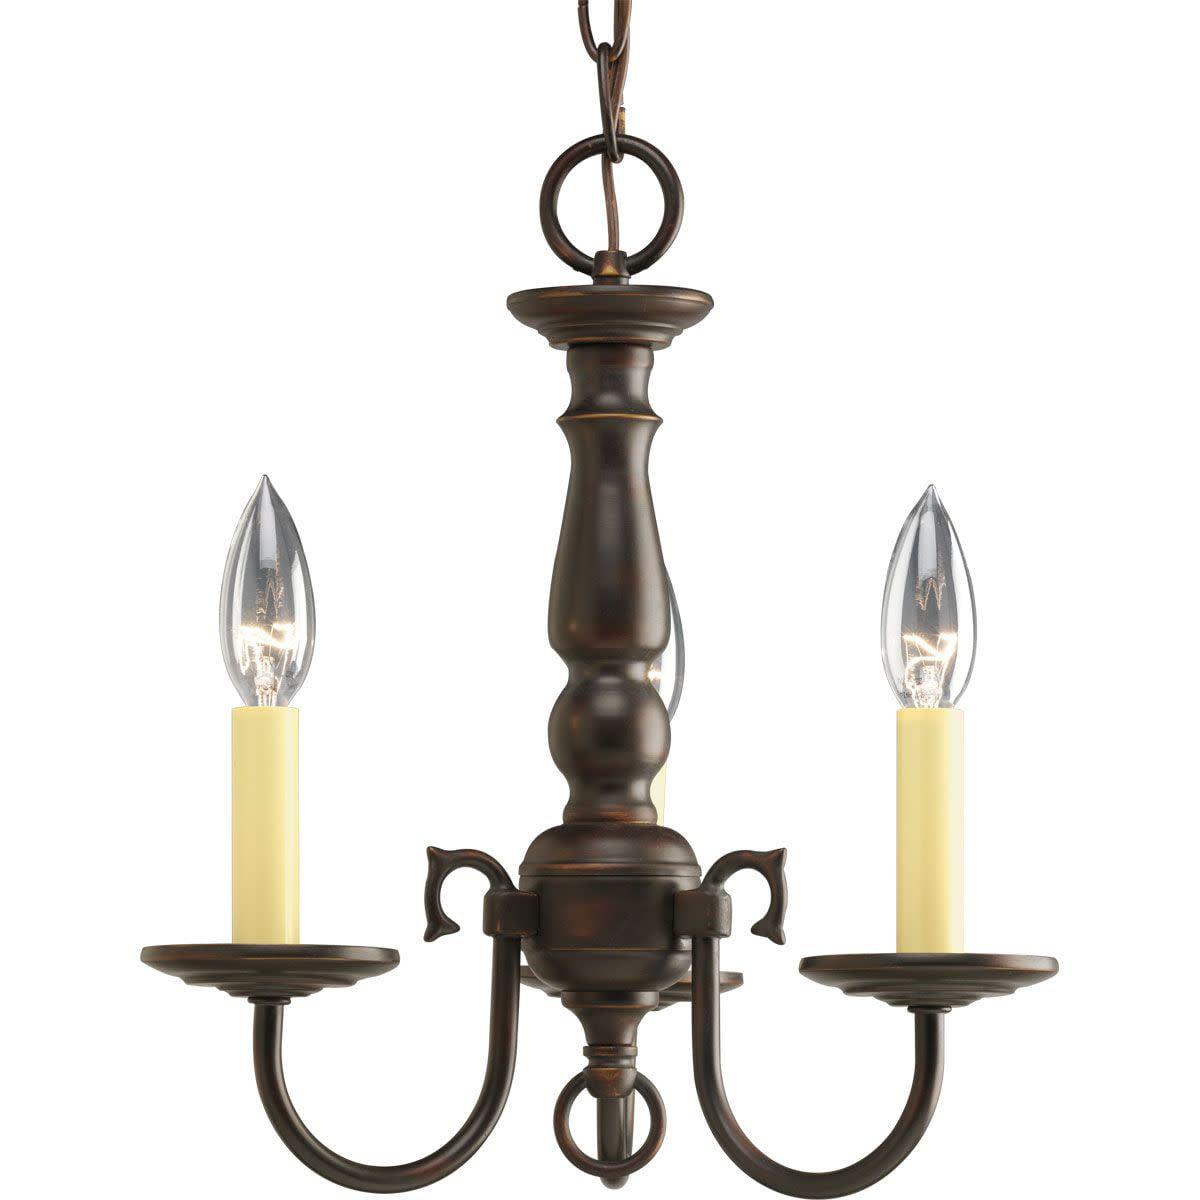 Americana Collection Three-Light Chandelier